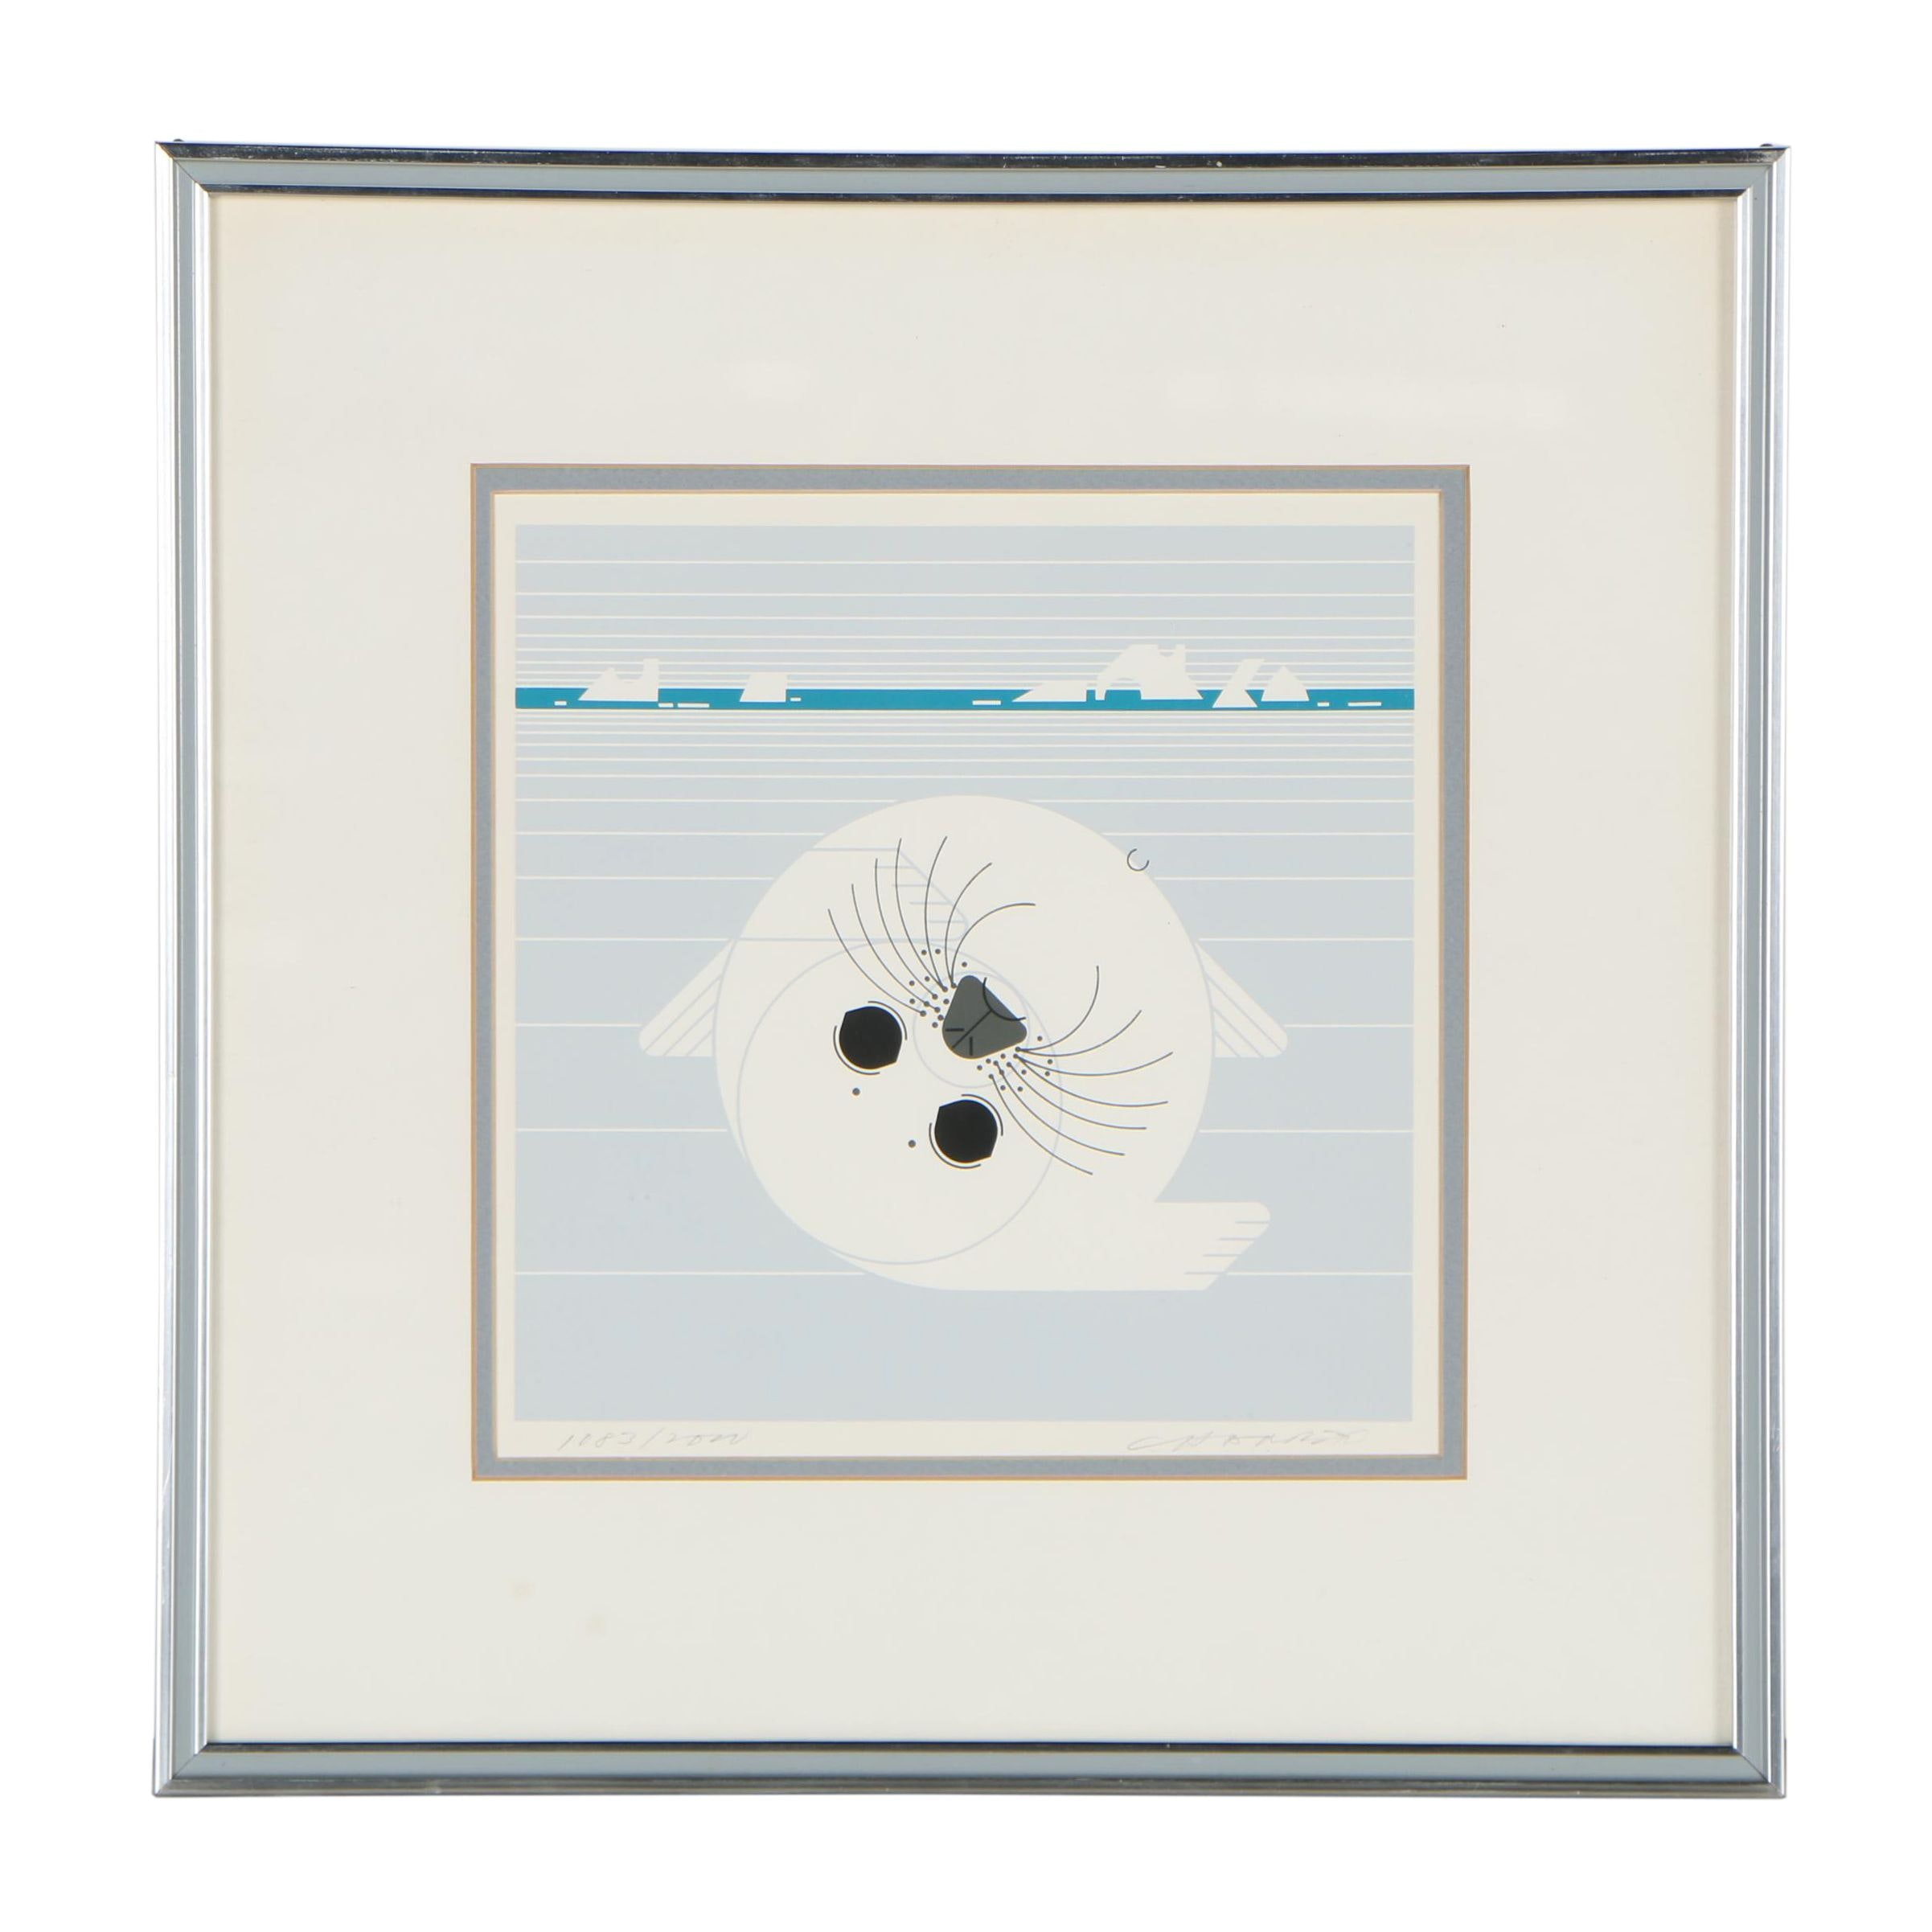 "Charley Harper Serigraph ""Whitecoat"", 1975"